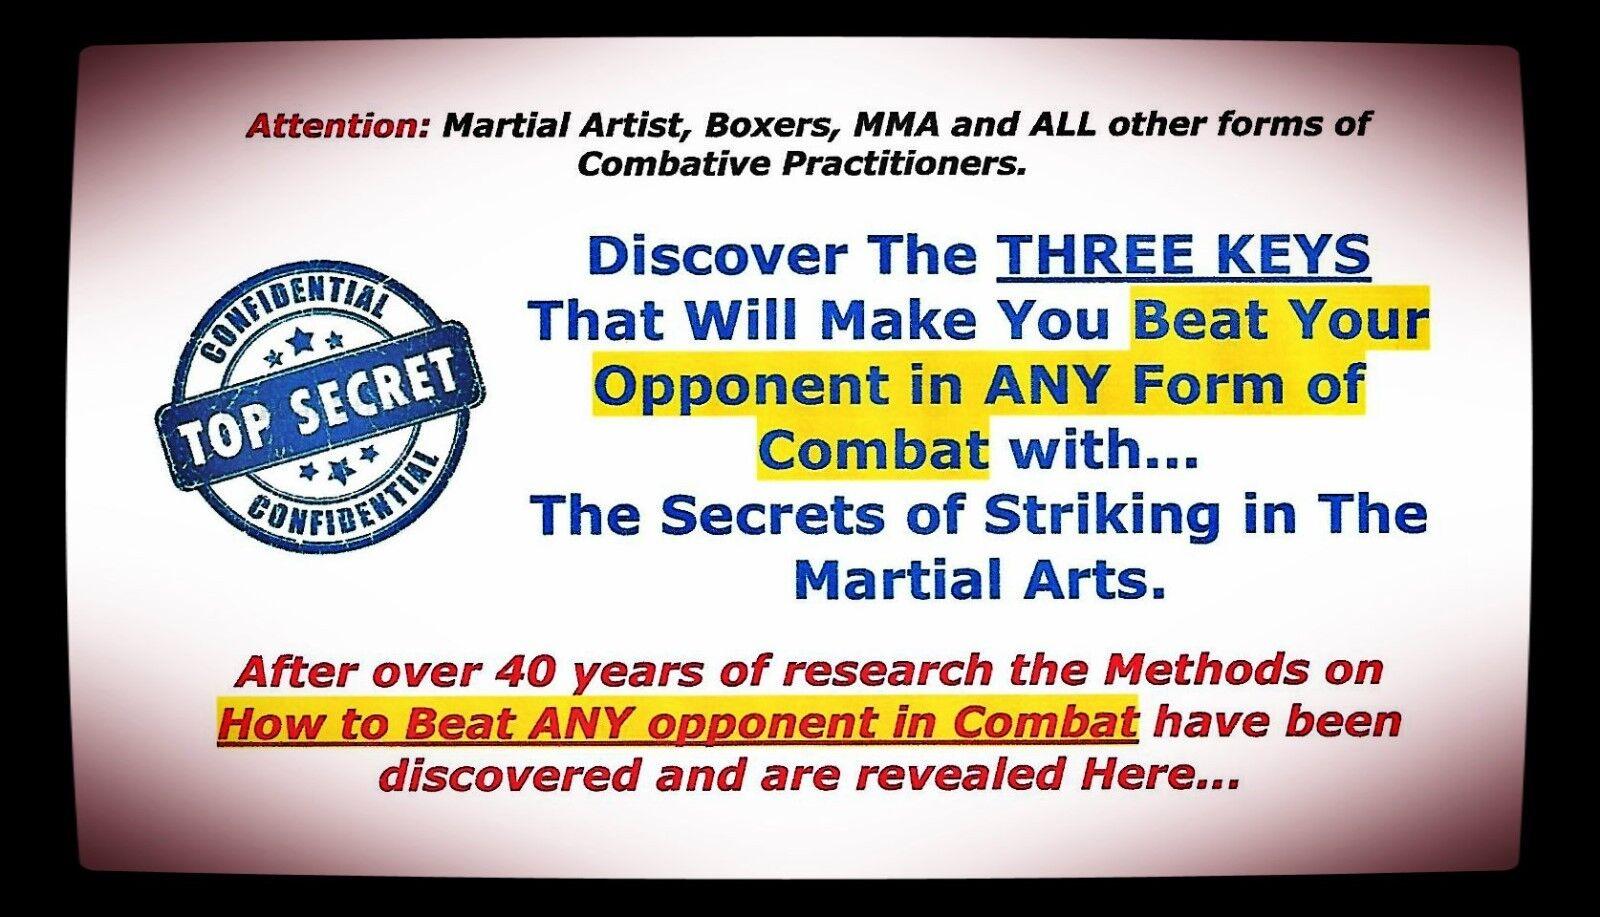 Kempo Karate, Artes Marciales secretos llamativo reveló-gran  maestro Jim Brassard  barato en línea